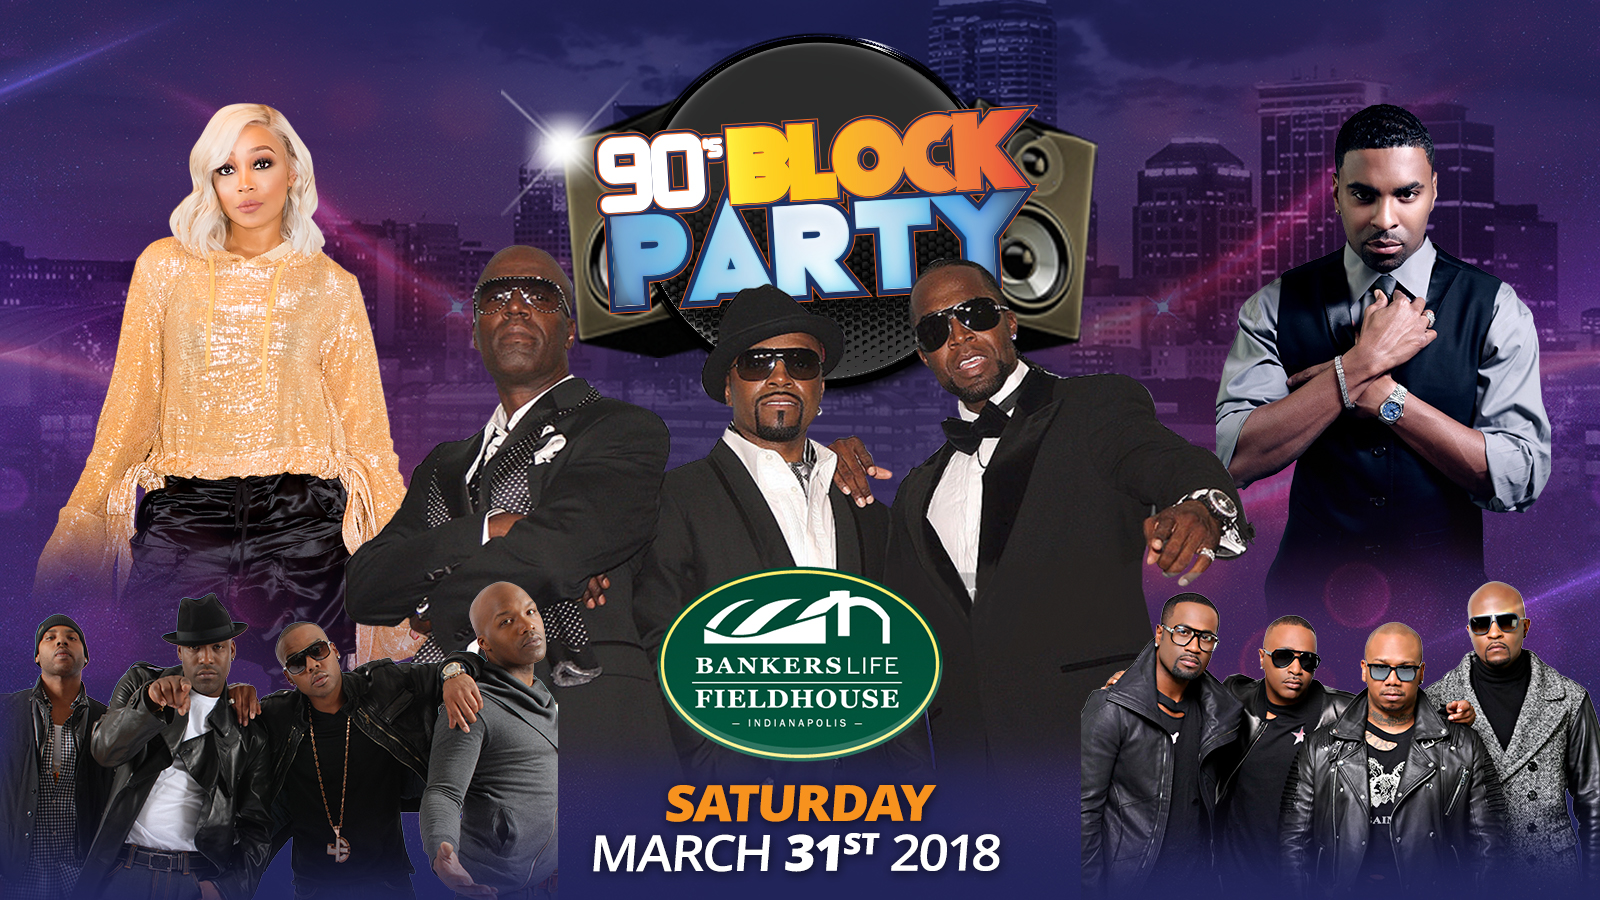 90's Block Party Flyer